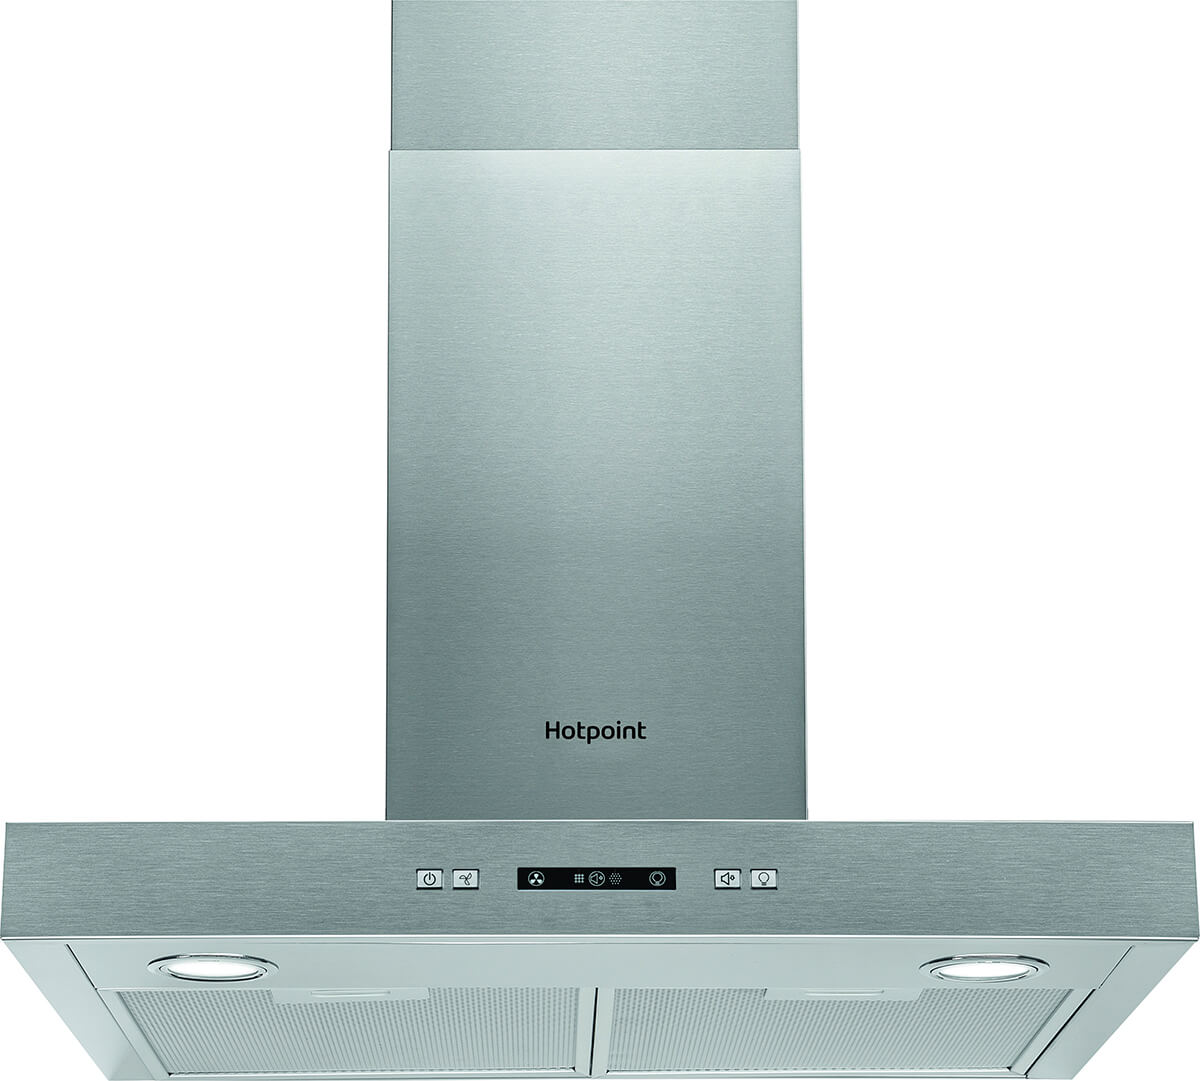 HPT750